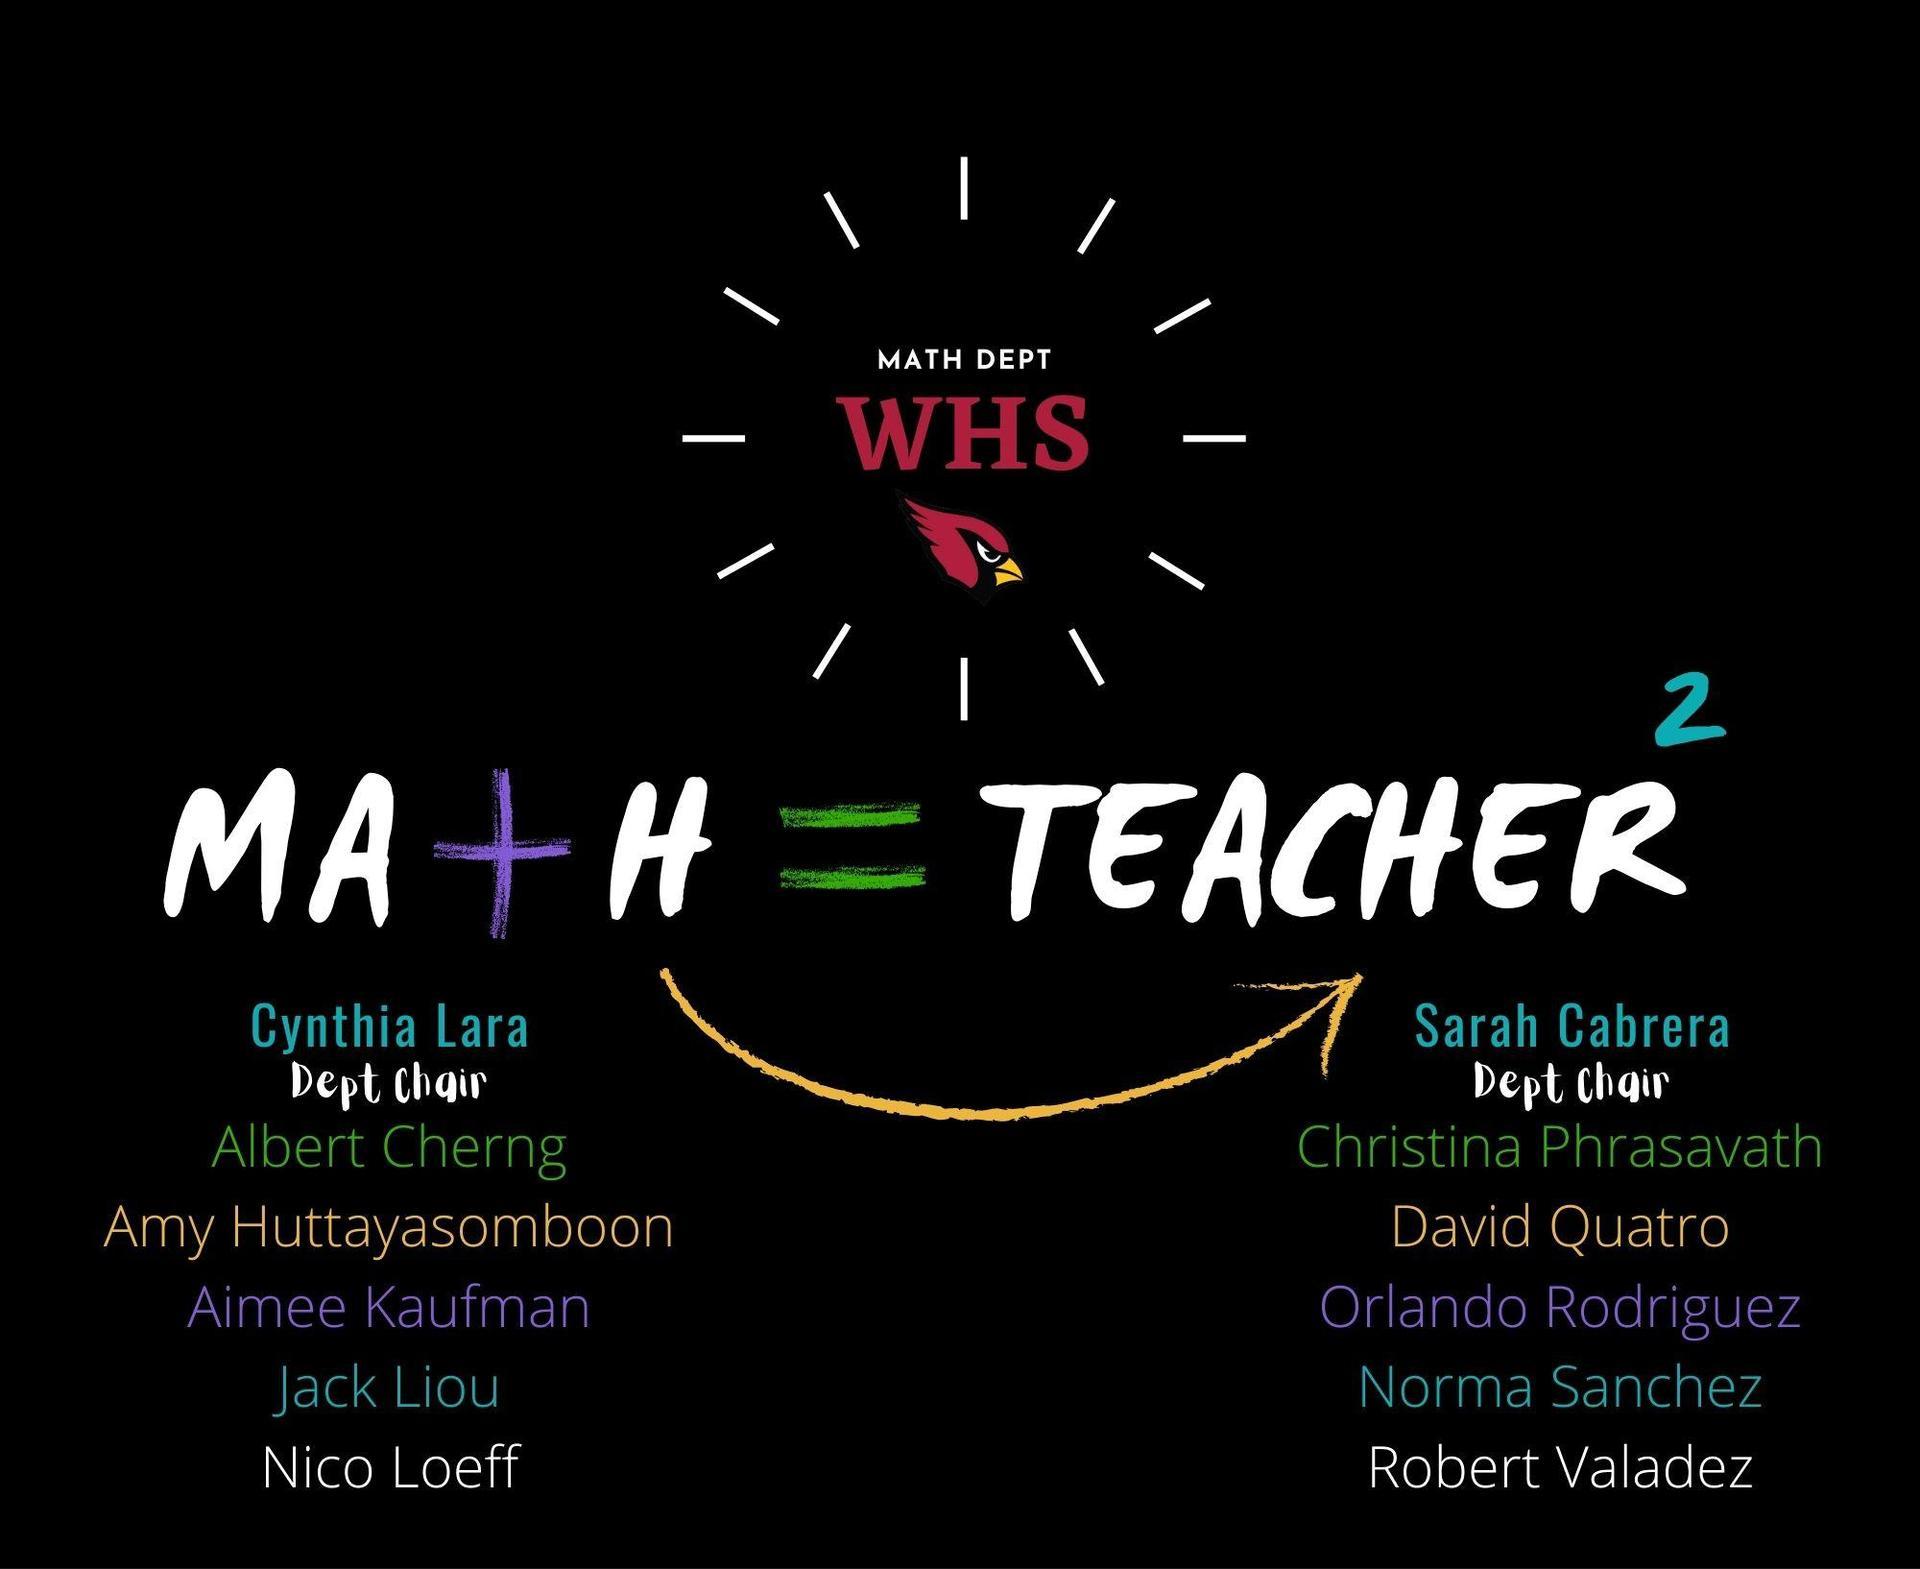 WHS Math Department